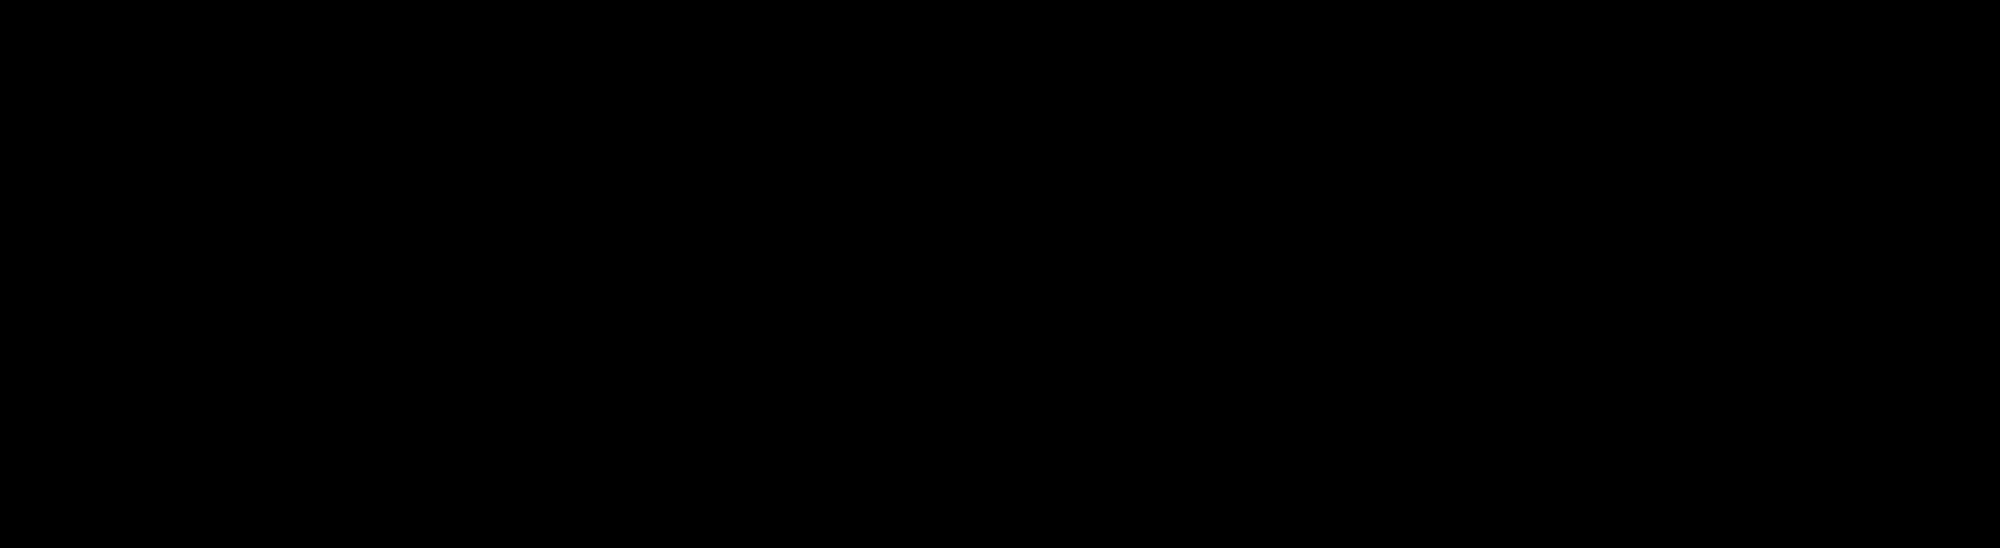 GO-035